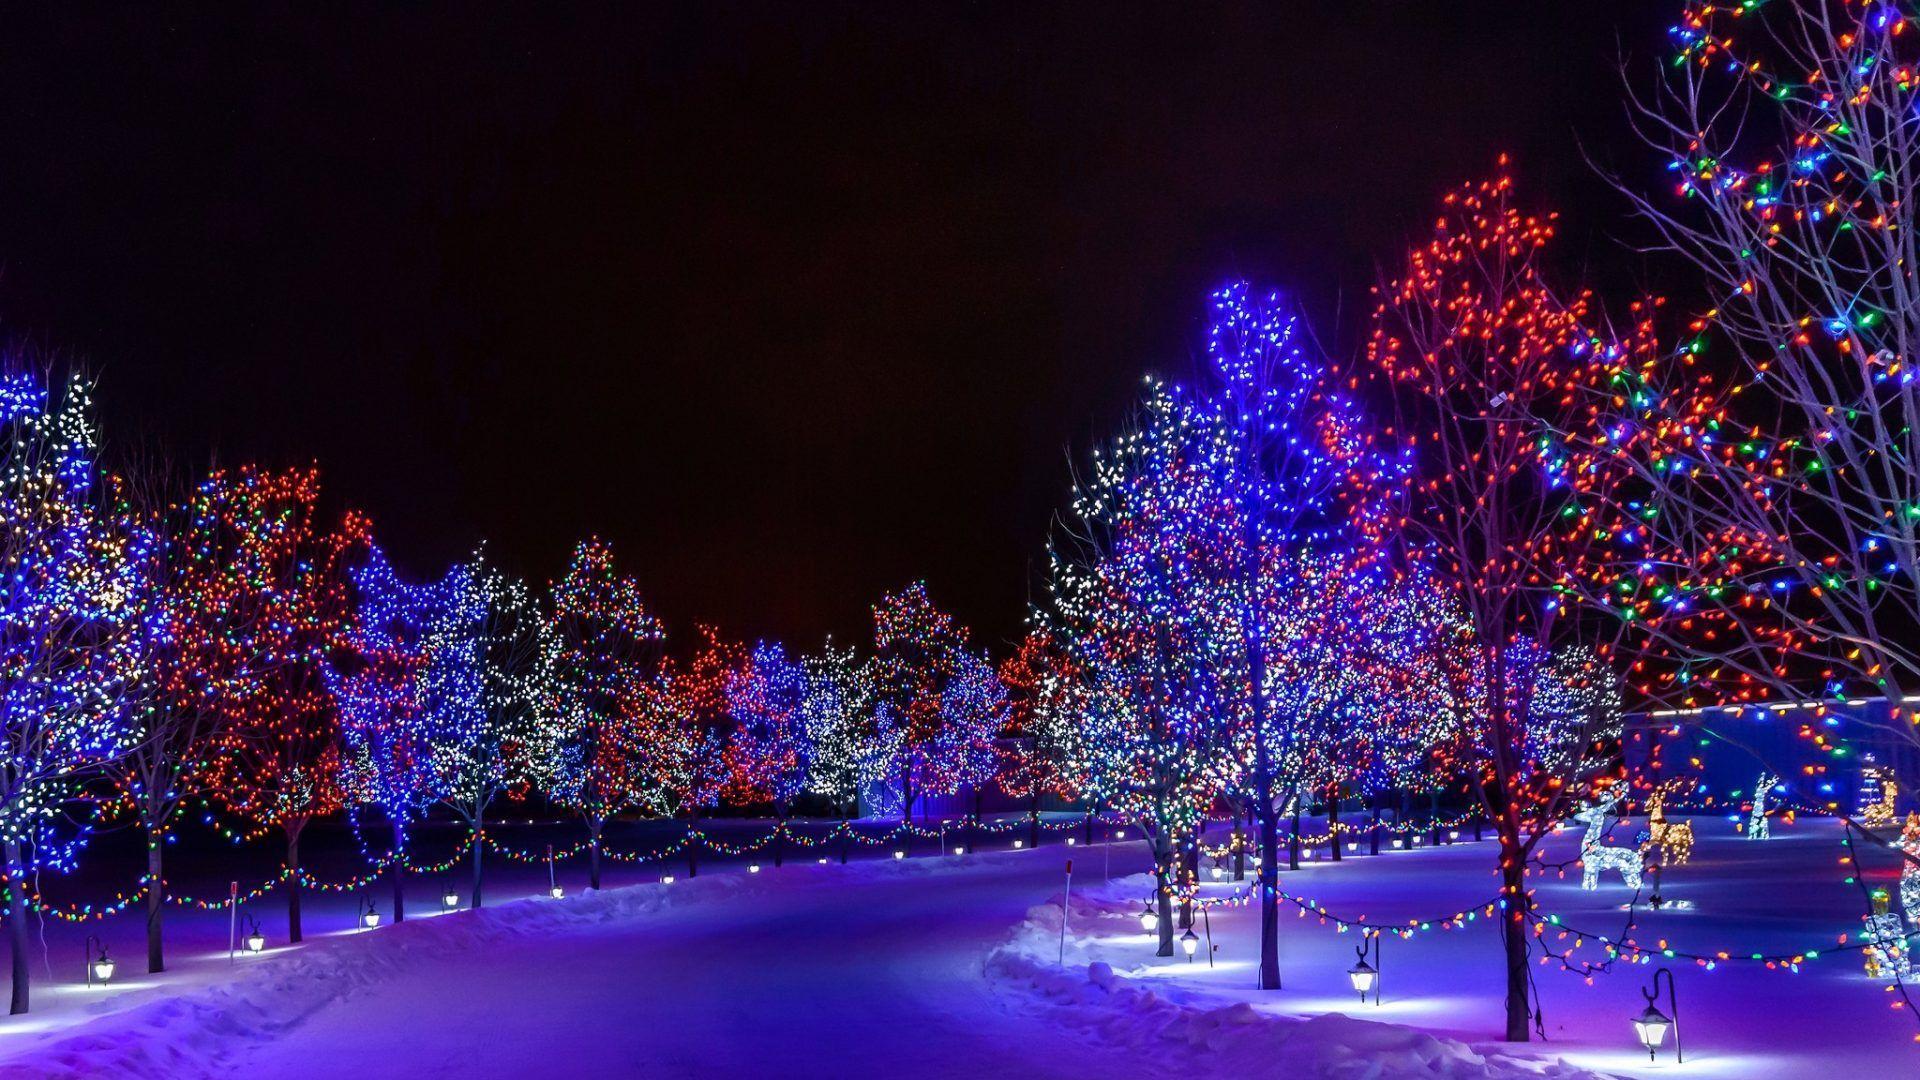 Christmas Light Snow Wallpapers Wallpaper Cave